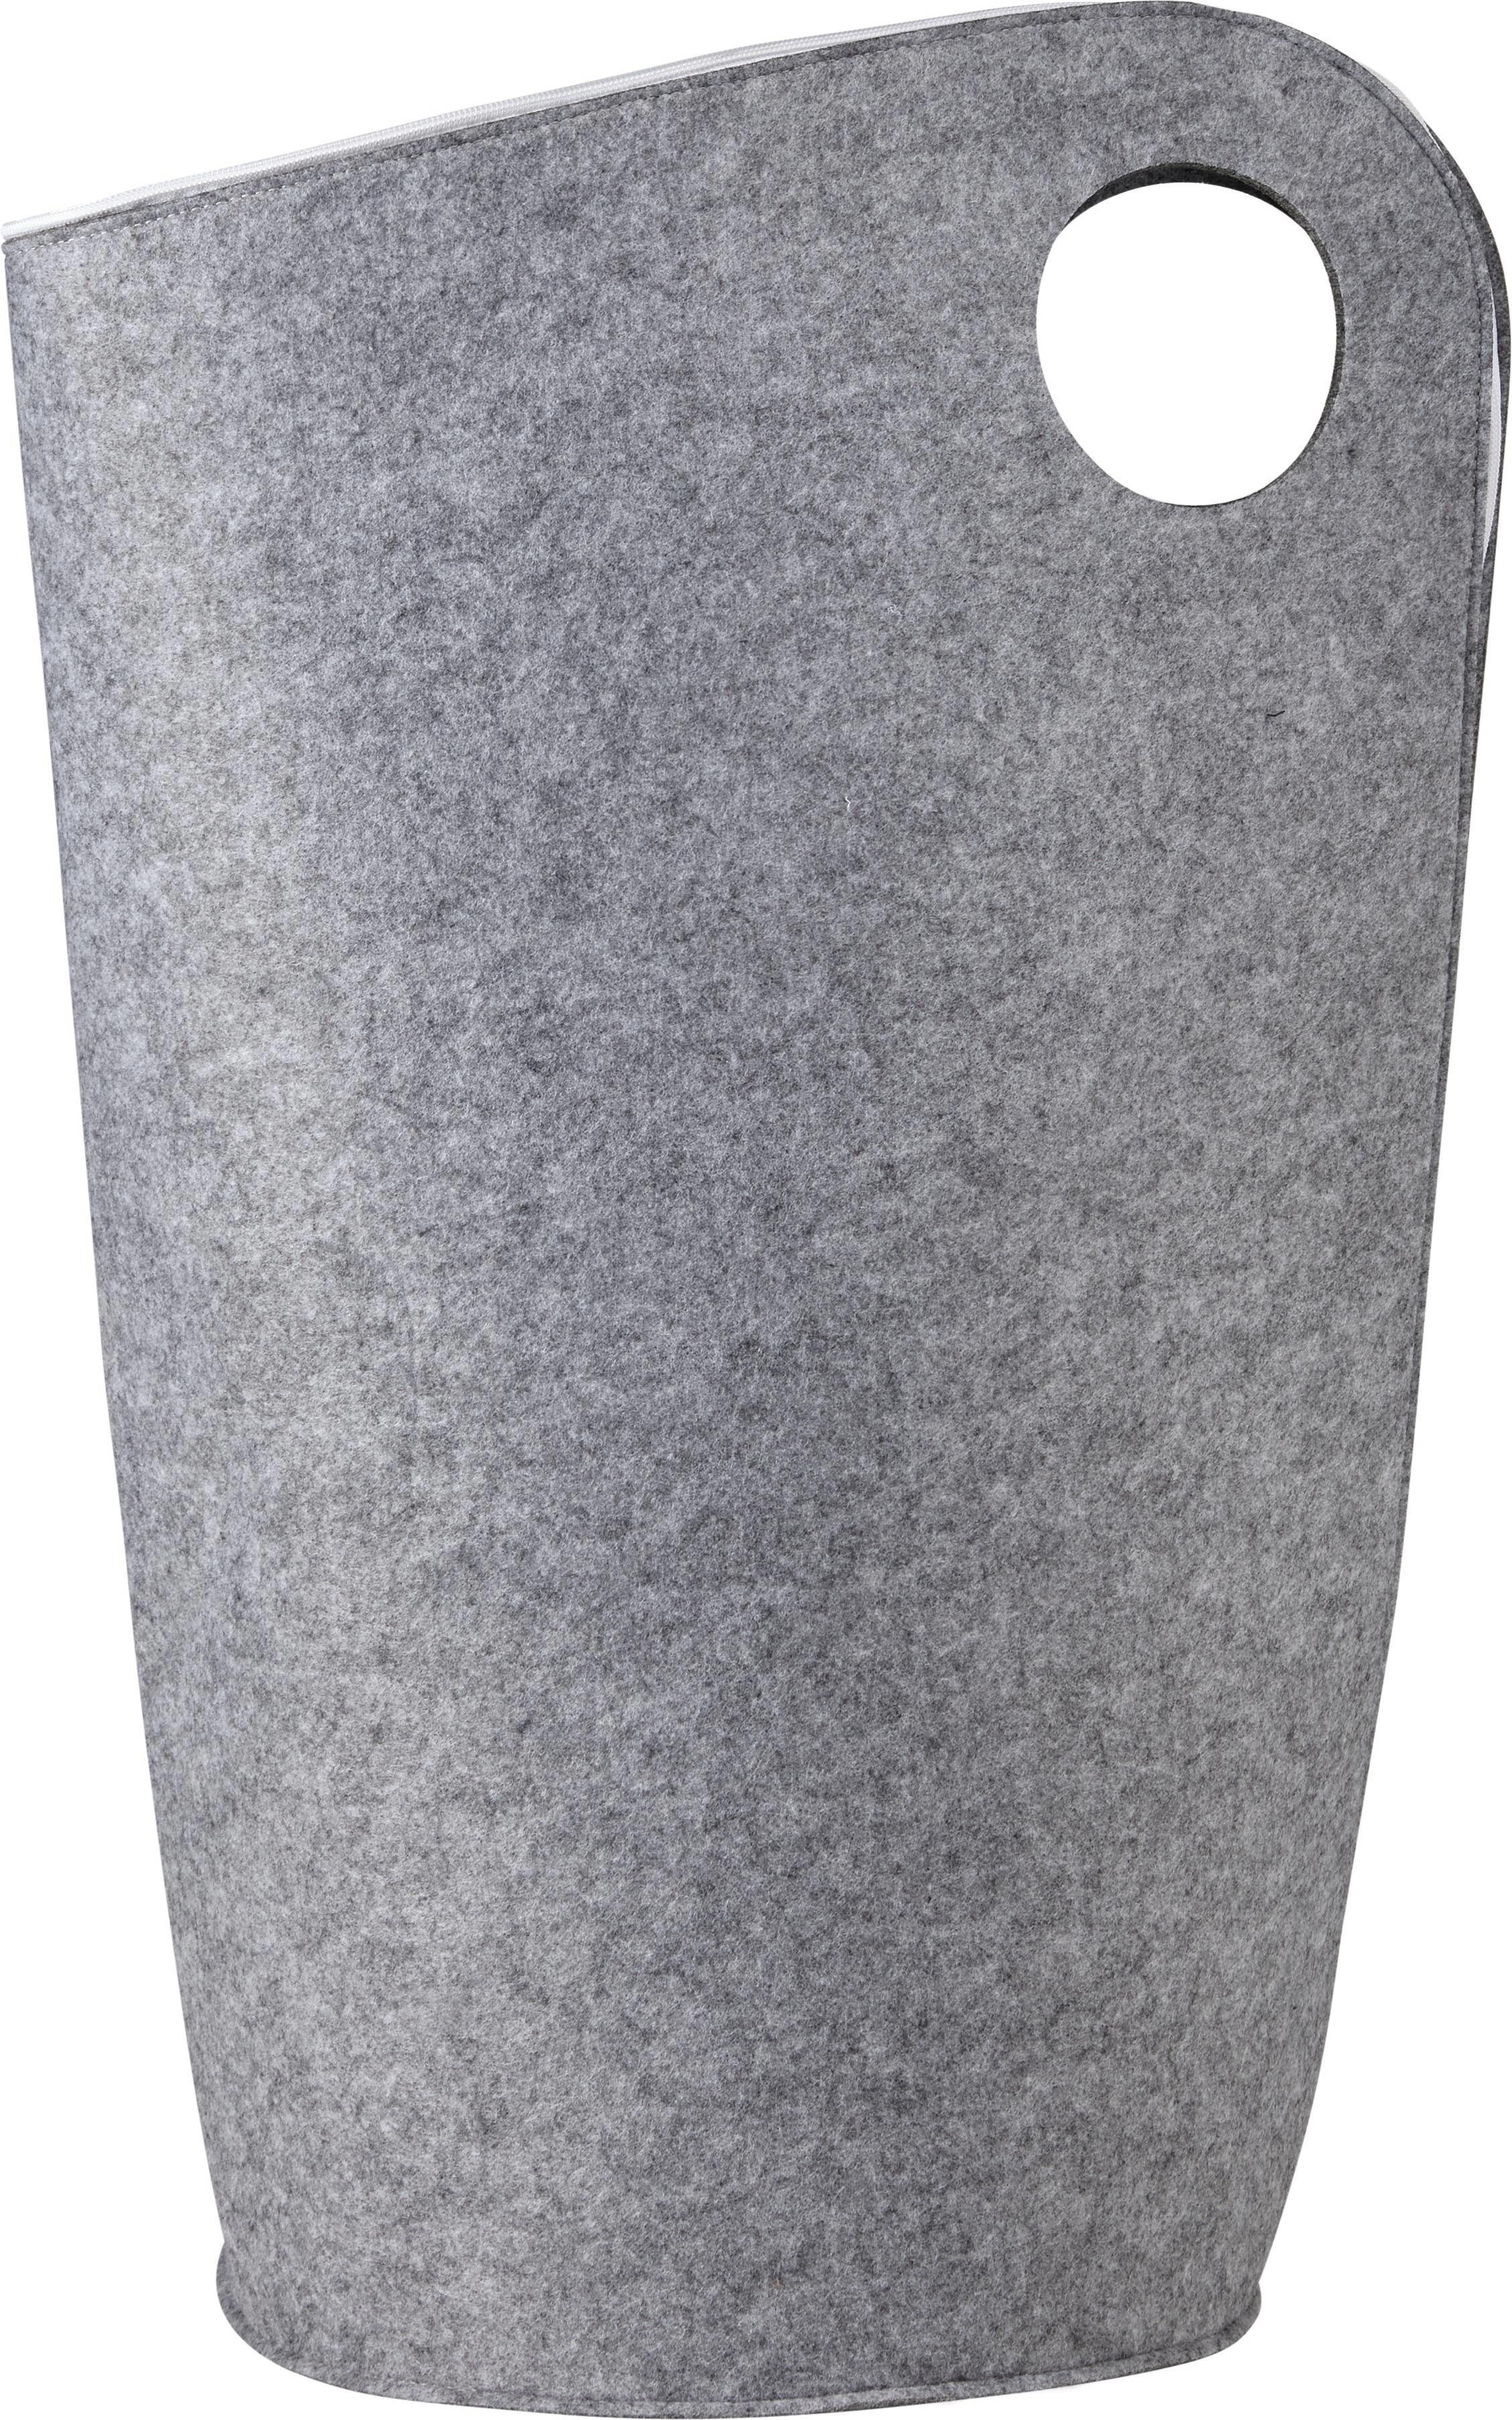 Wäschebox Amira - Hellgrau, MODERN, Textil (45/31/68cm) - MÖMAX modern living